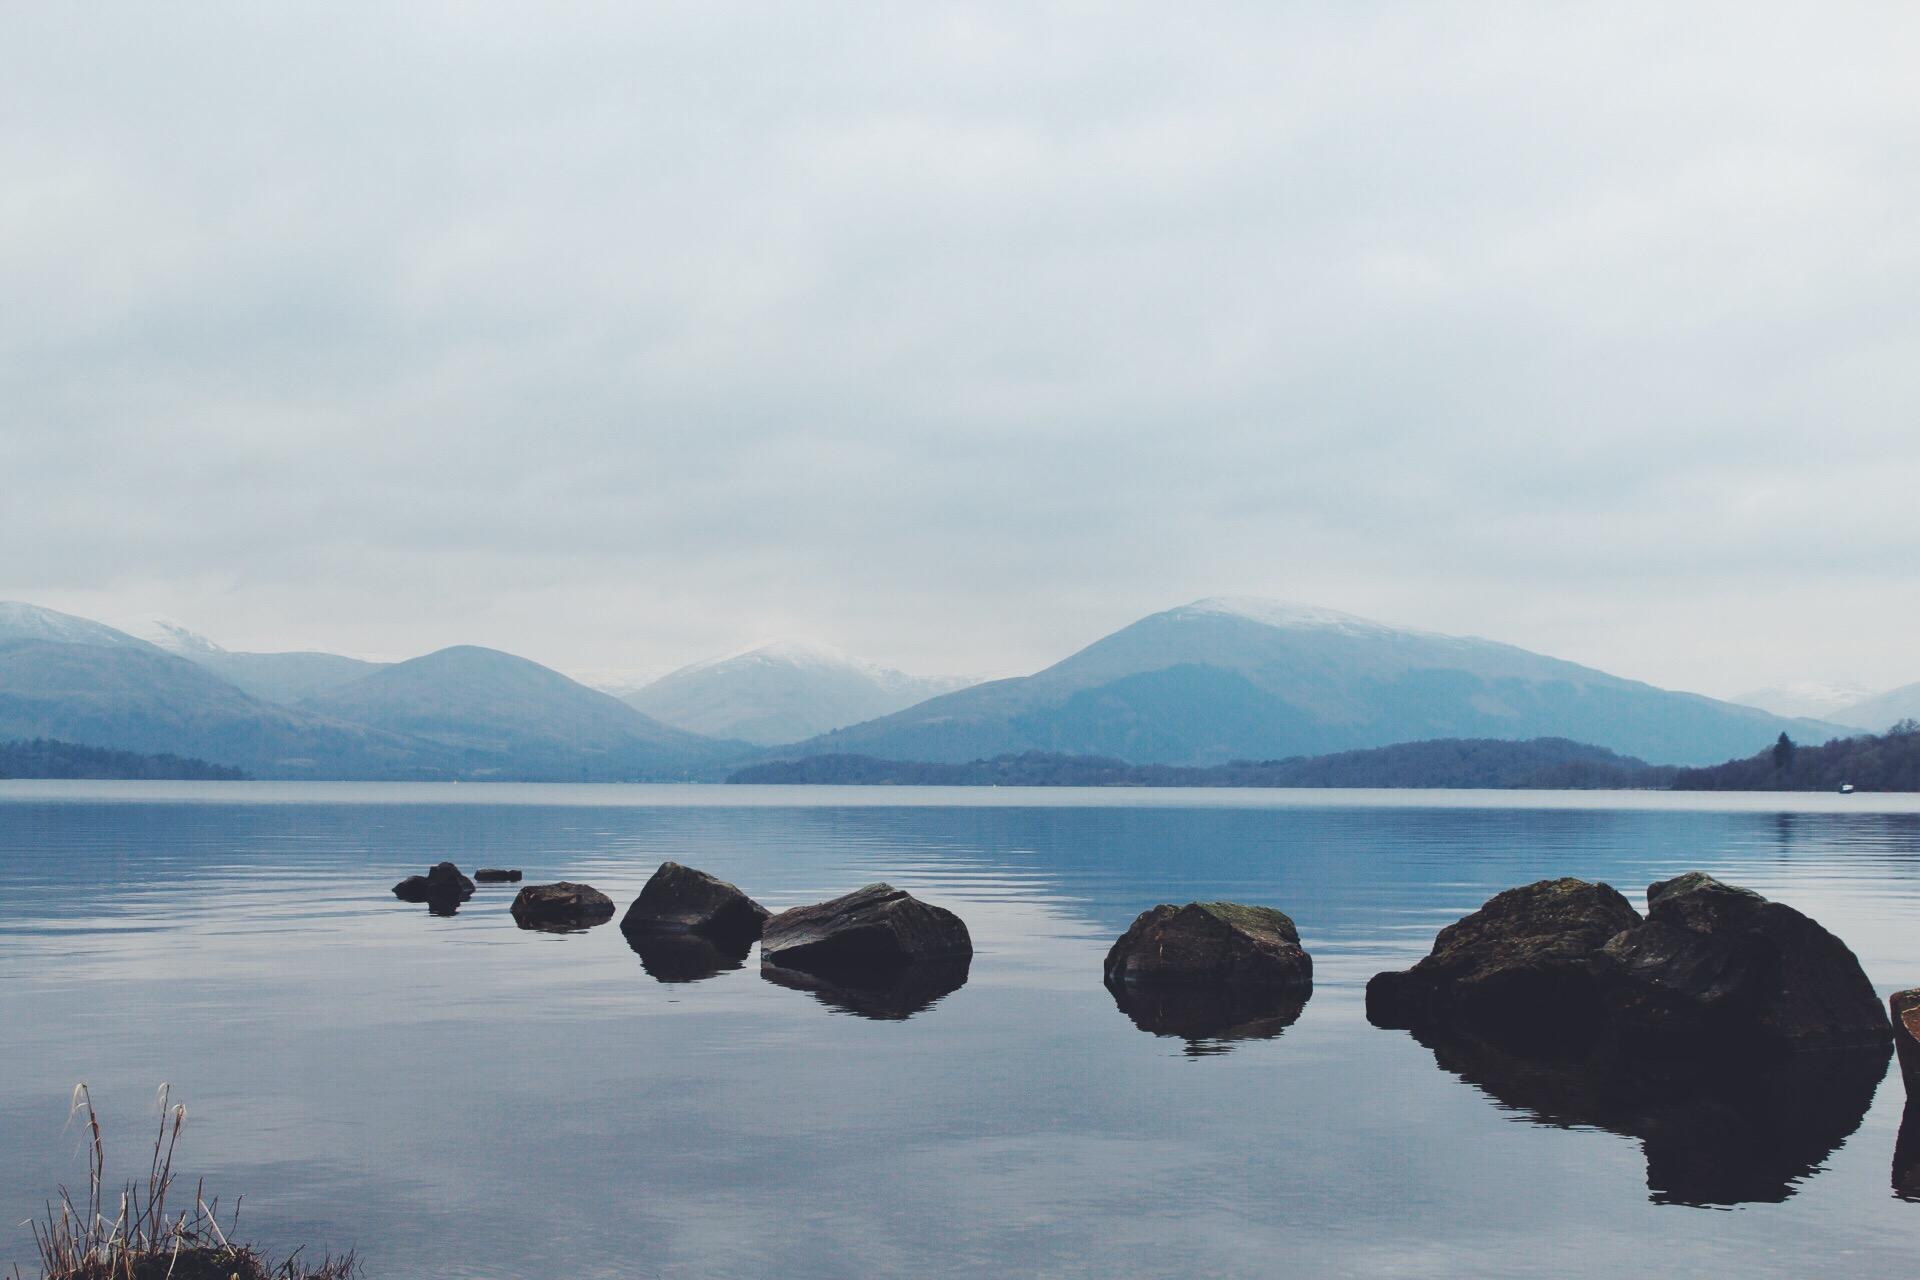 Stunning Loch Lomond